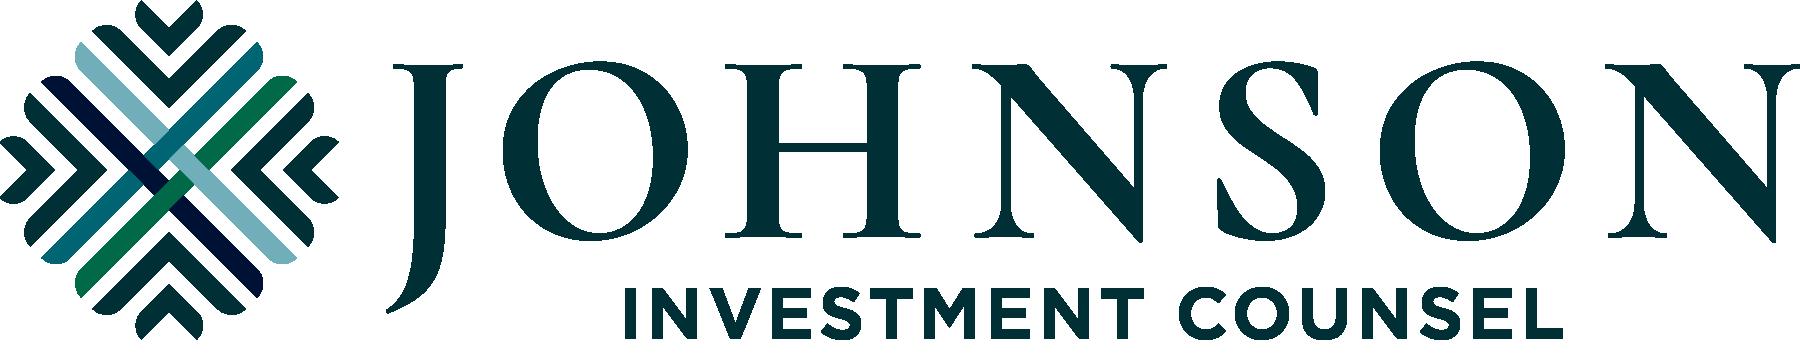 Johnson Investment Counsel logo